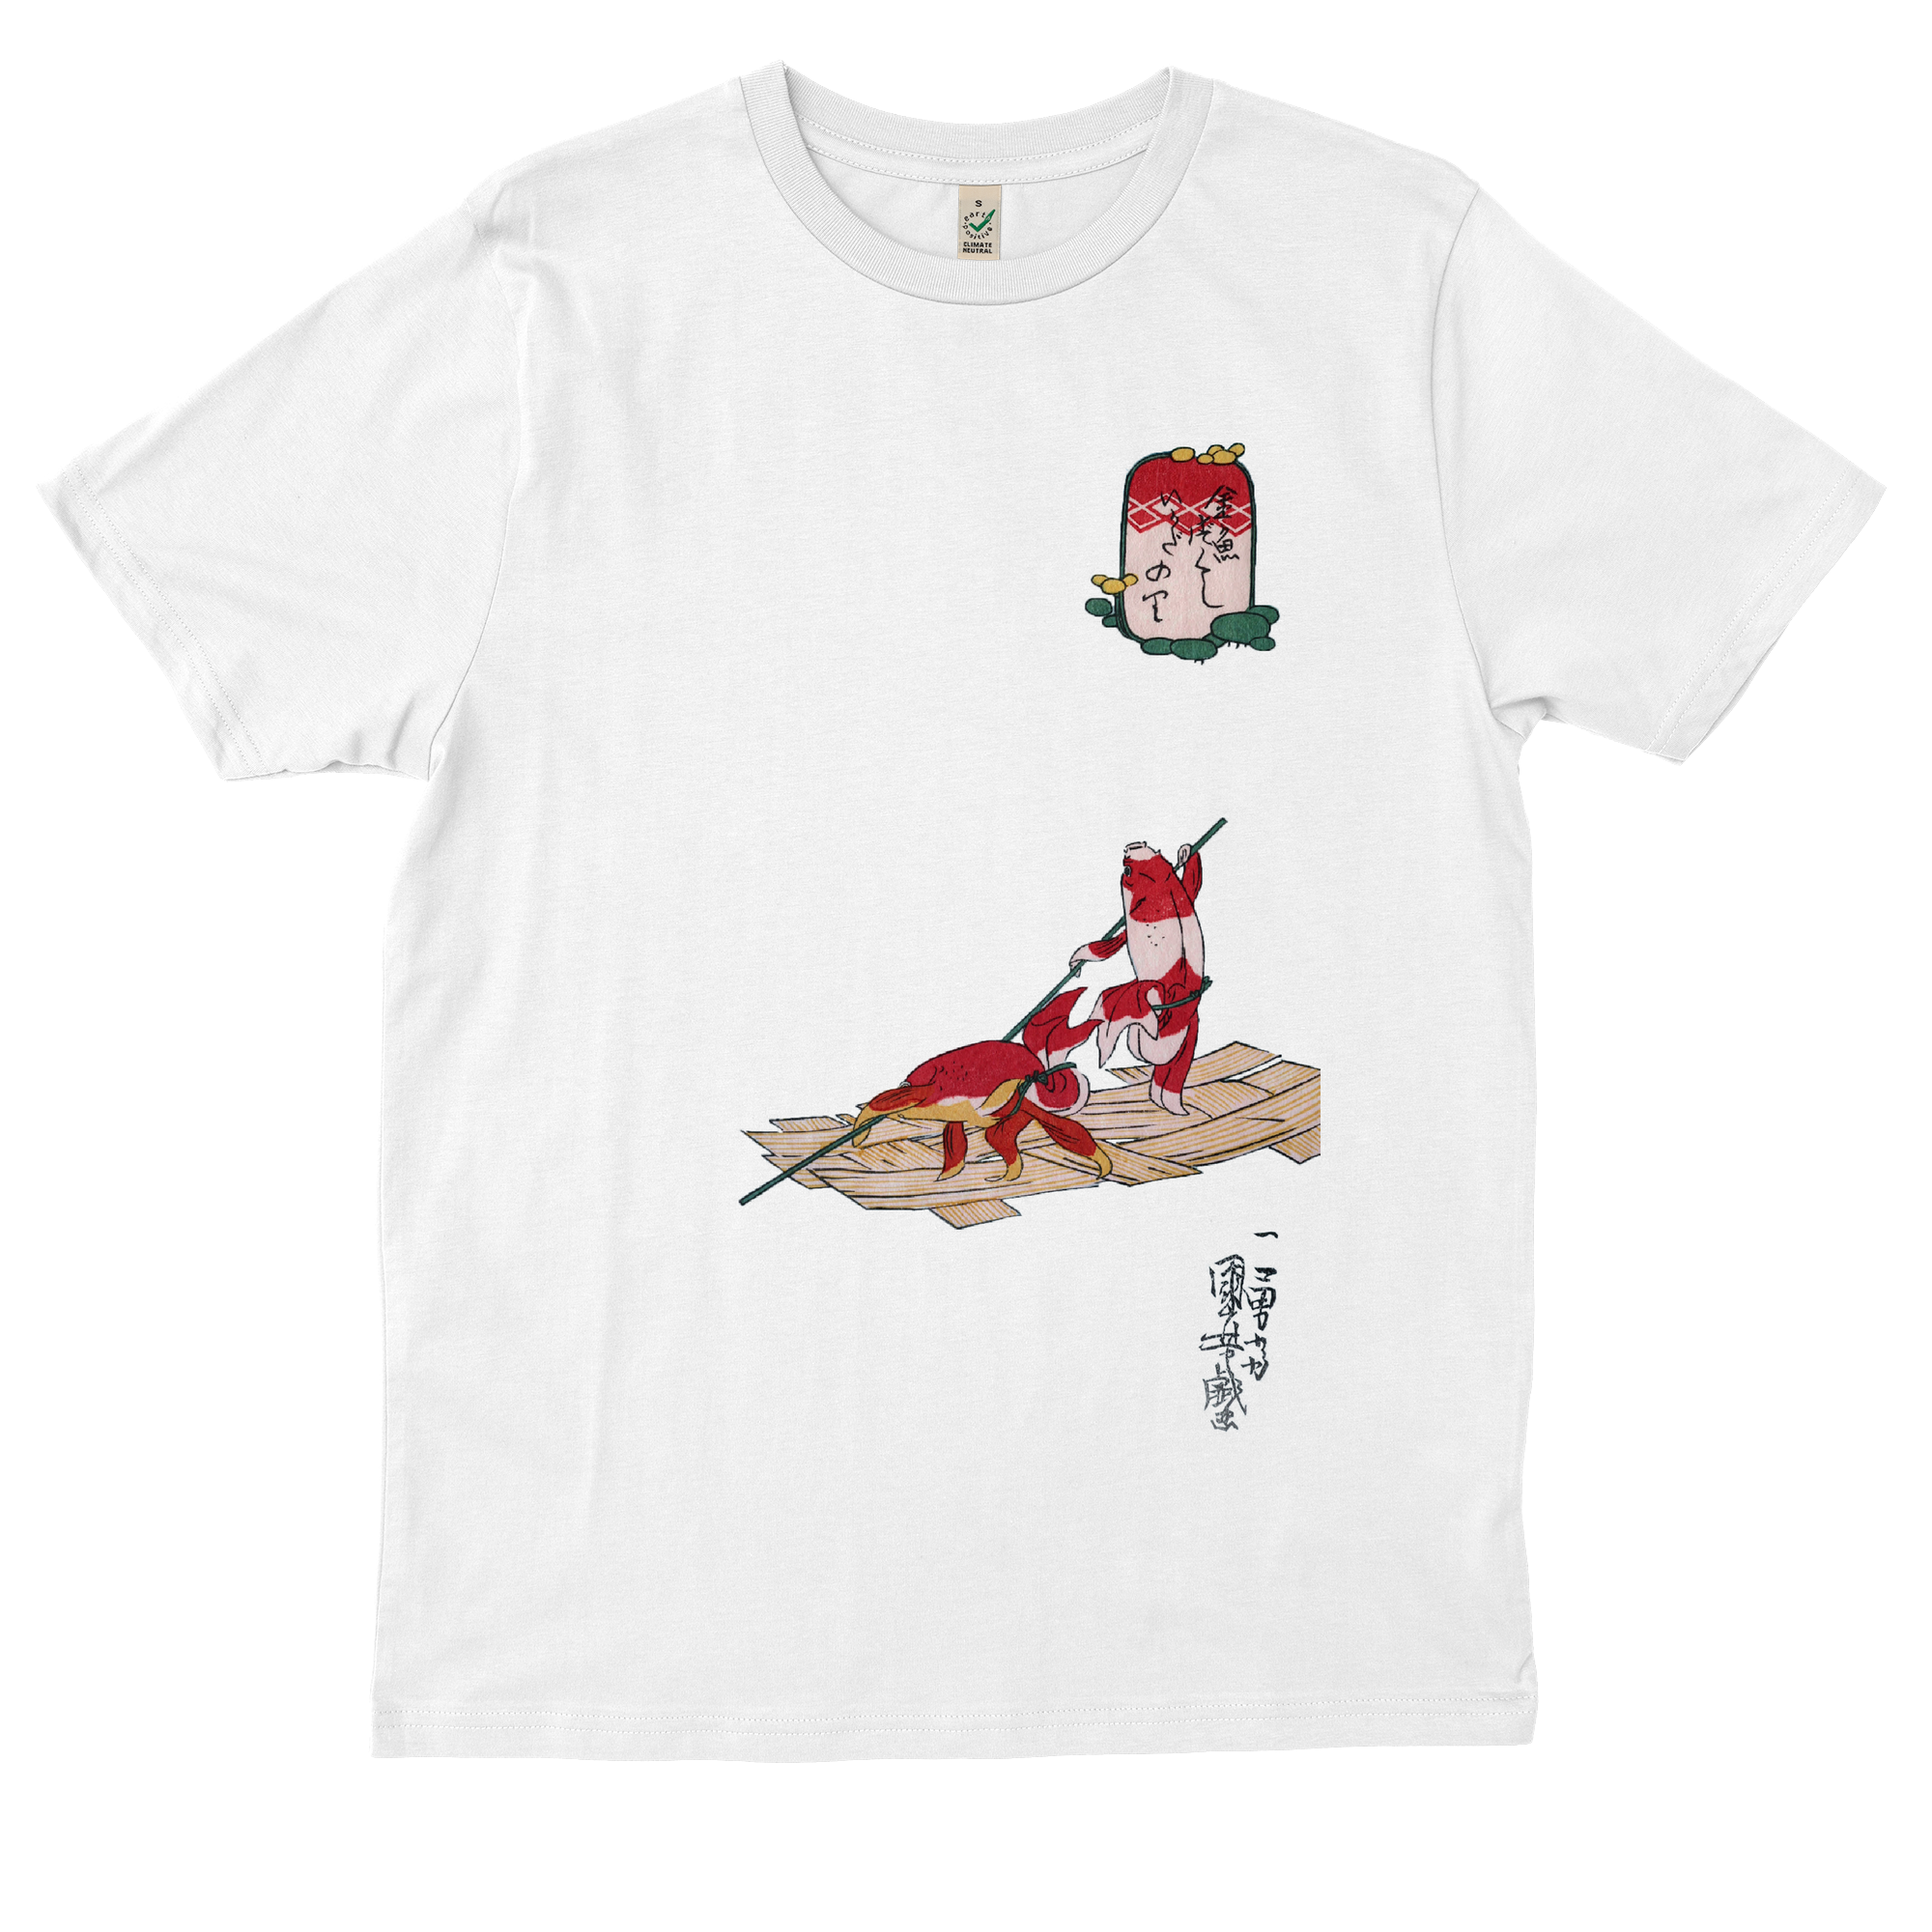 TT T-shirt campaign